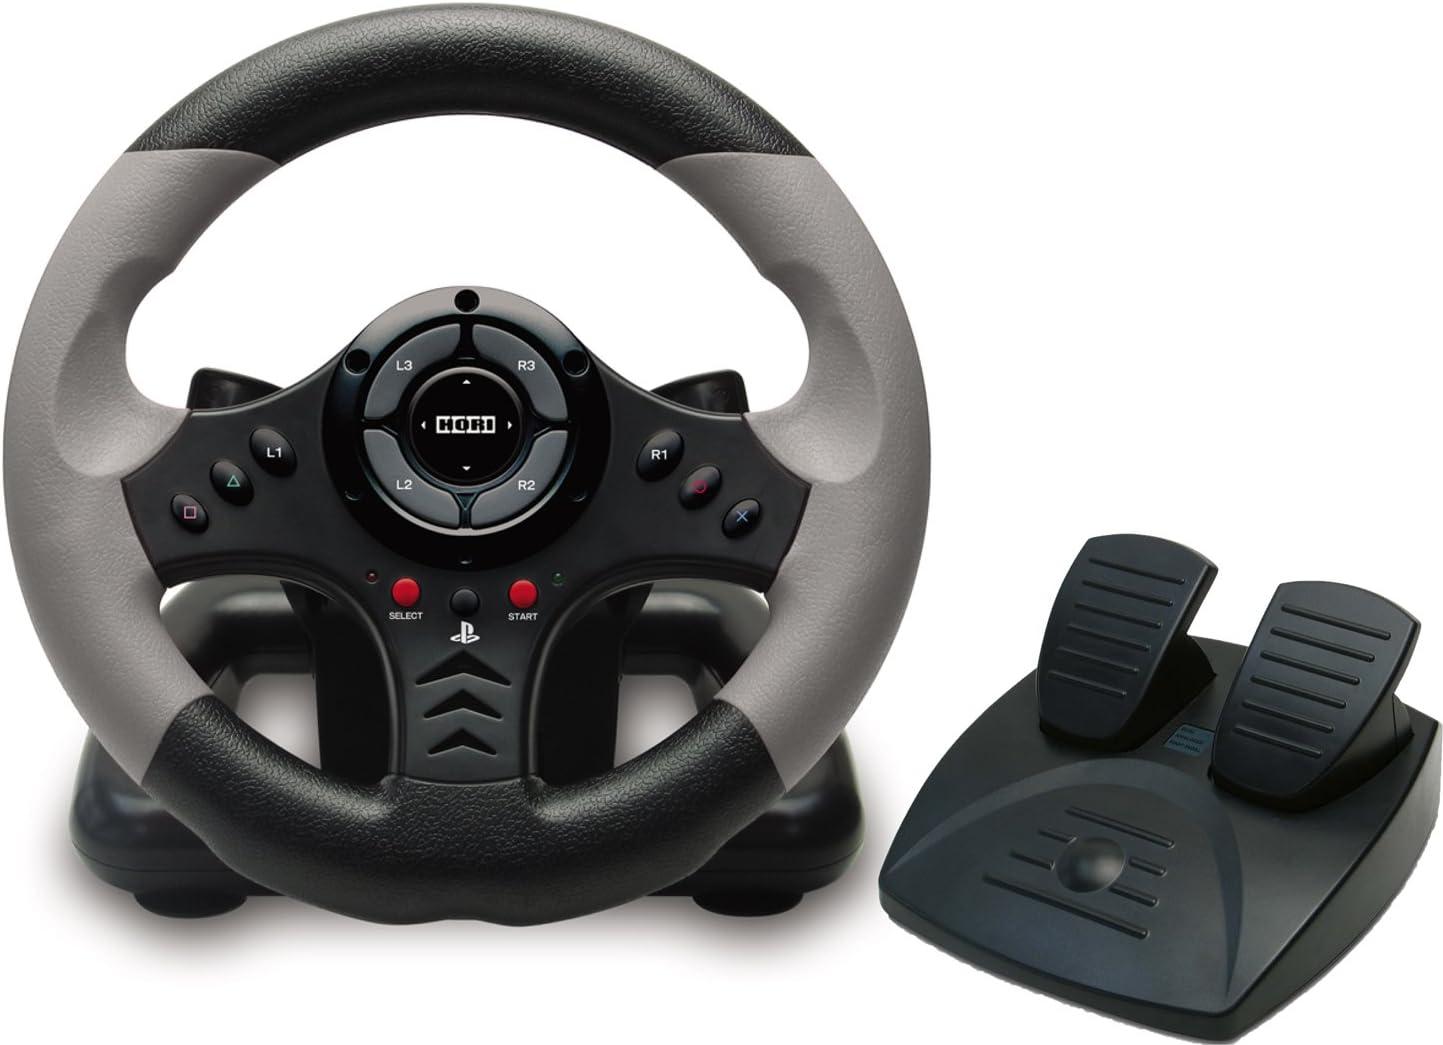 Amazon.com: PS3 Racing Wheel Controller: Playstation 3: Video Games